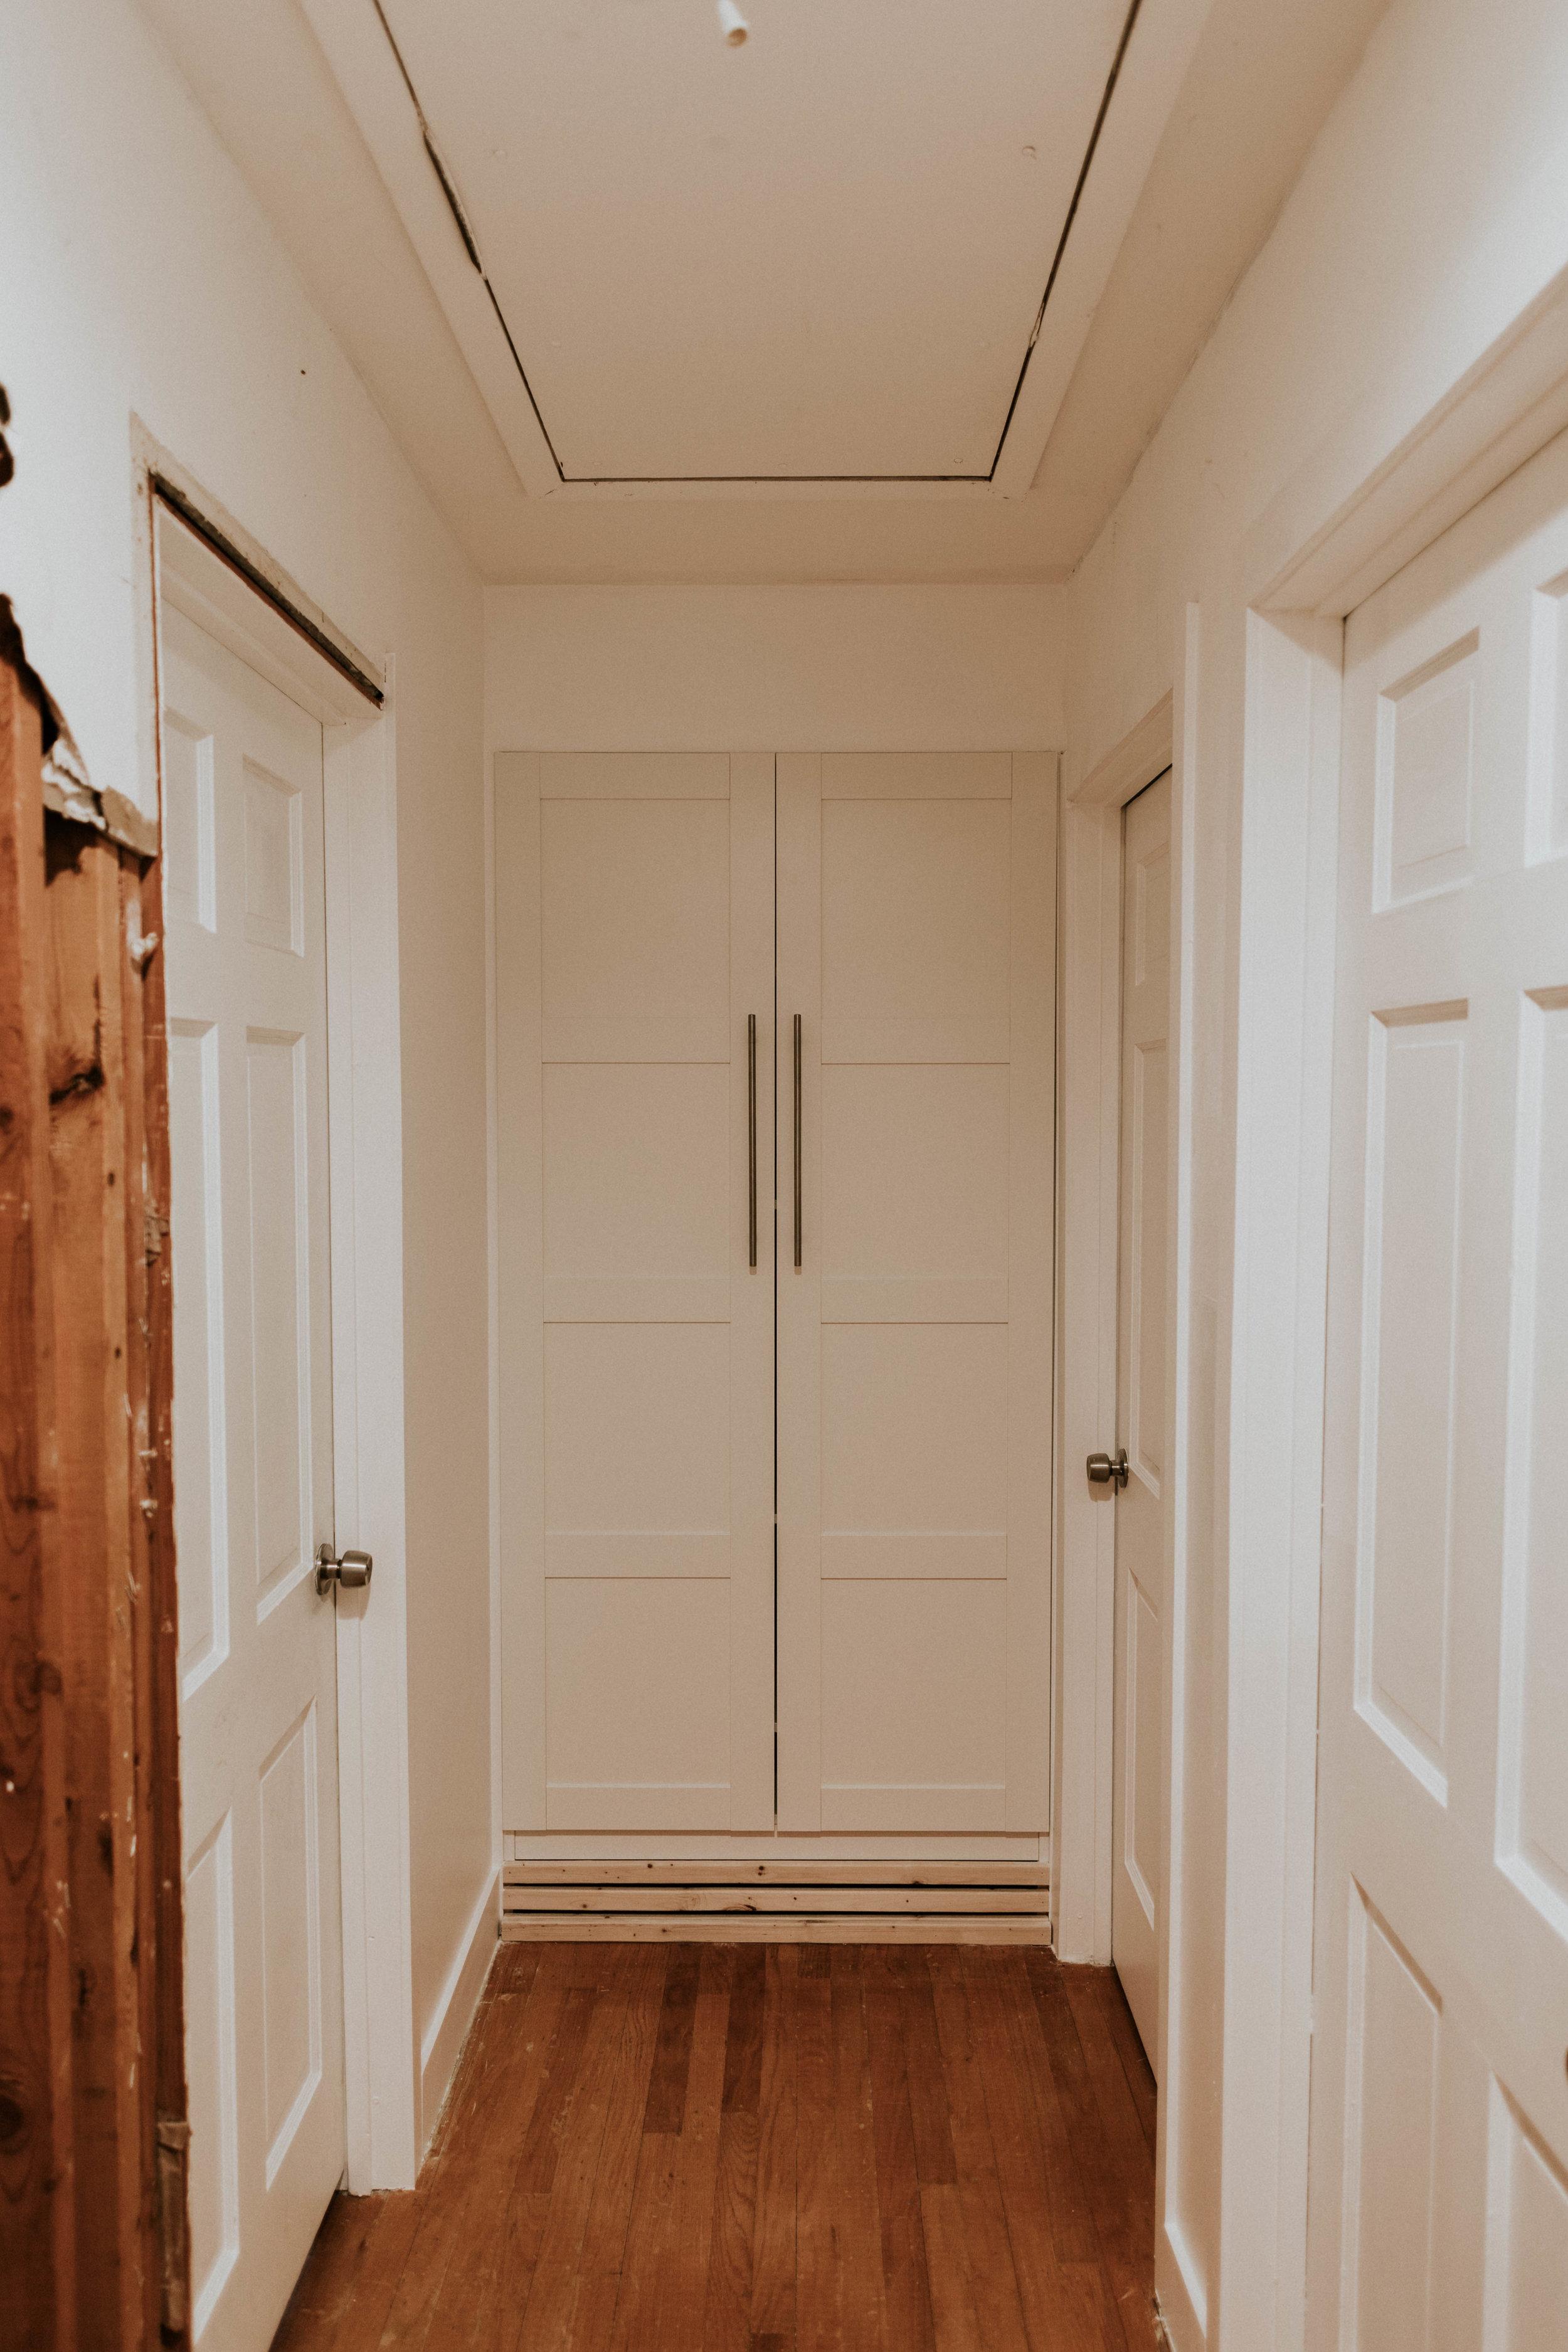 Ikea Pax Wardrobe in hallway